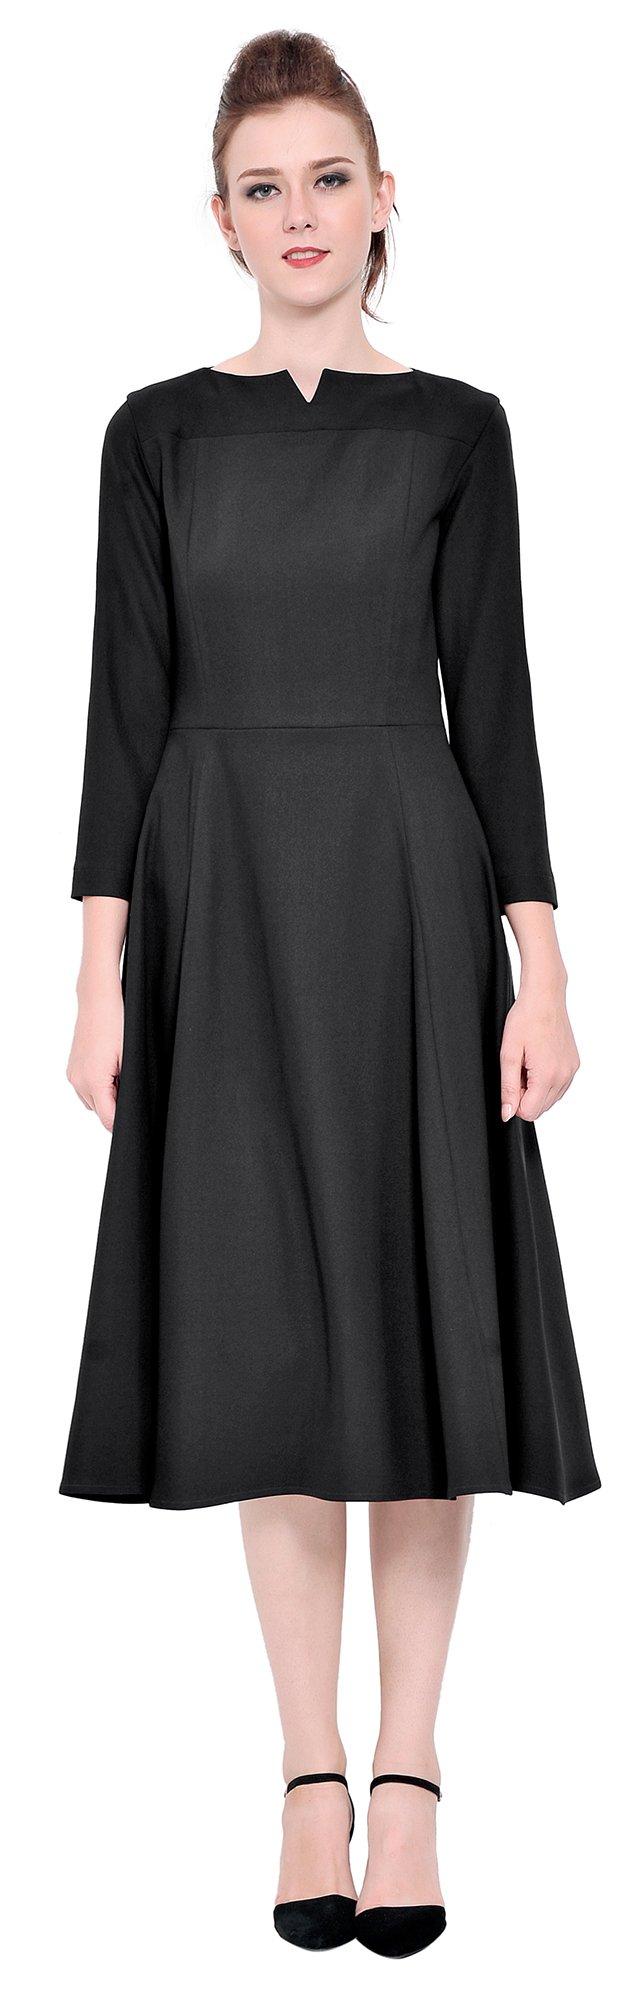 Marycrafts Womens Elegant Classy Office Business Long Tea Midi Dress 2 Black by Marycrafts